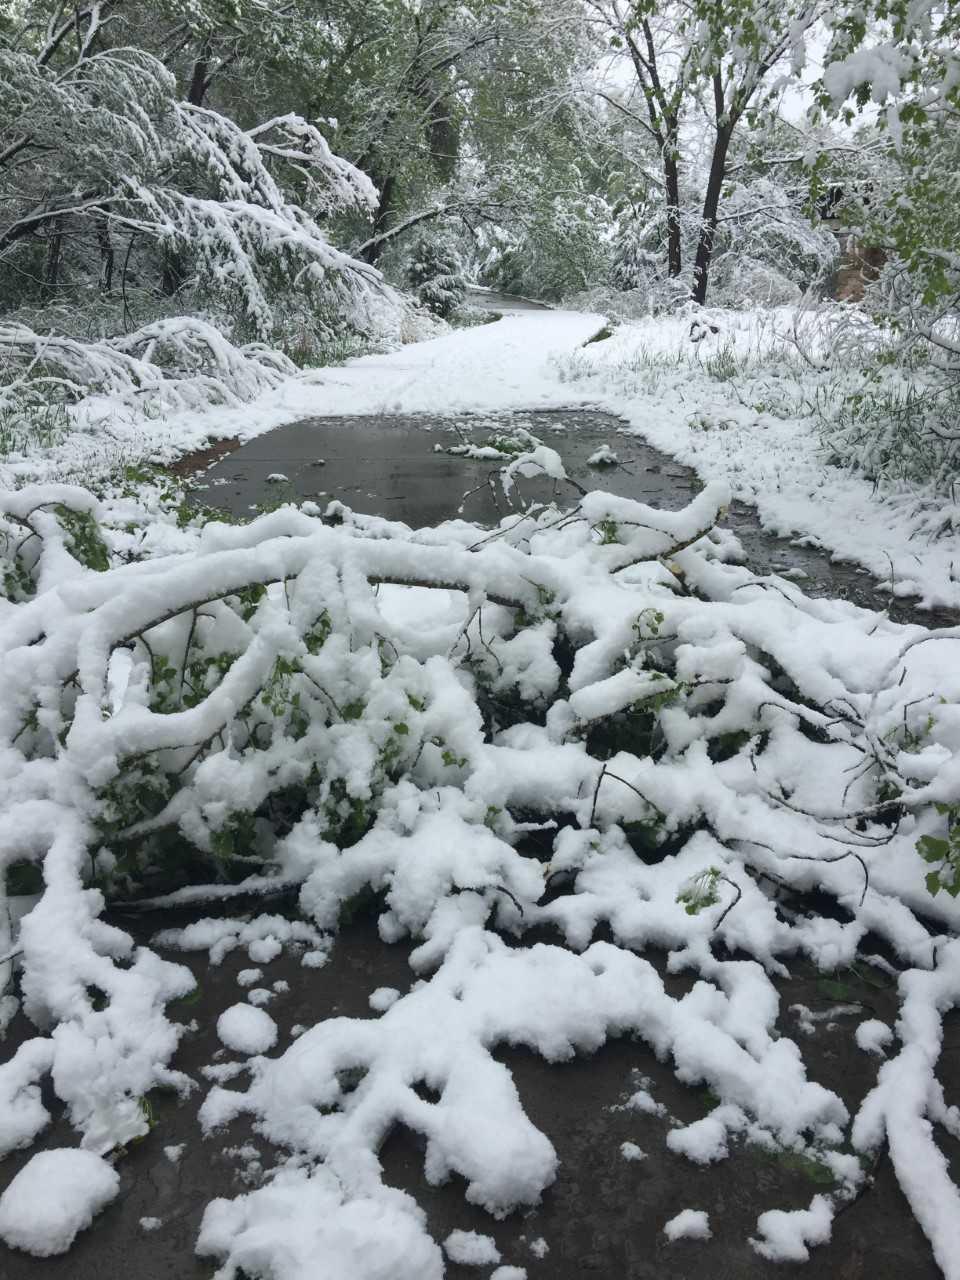 snowy tree_1558459397427.jpg.jpg